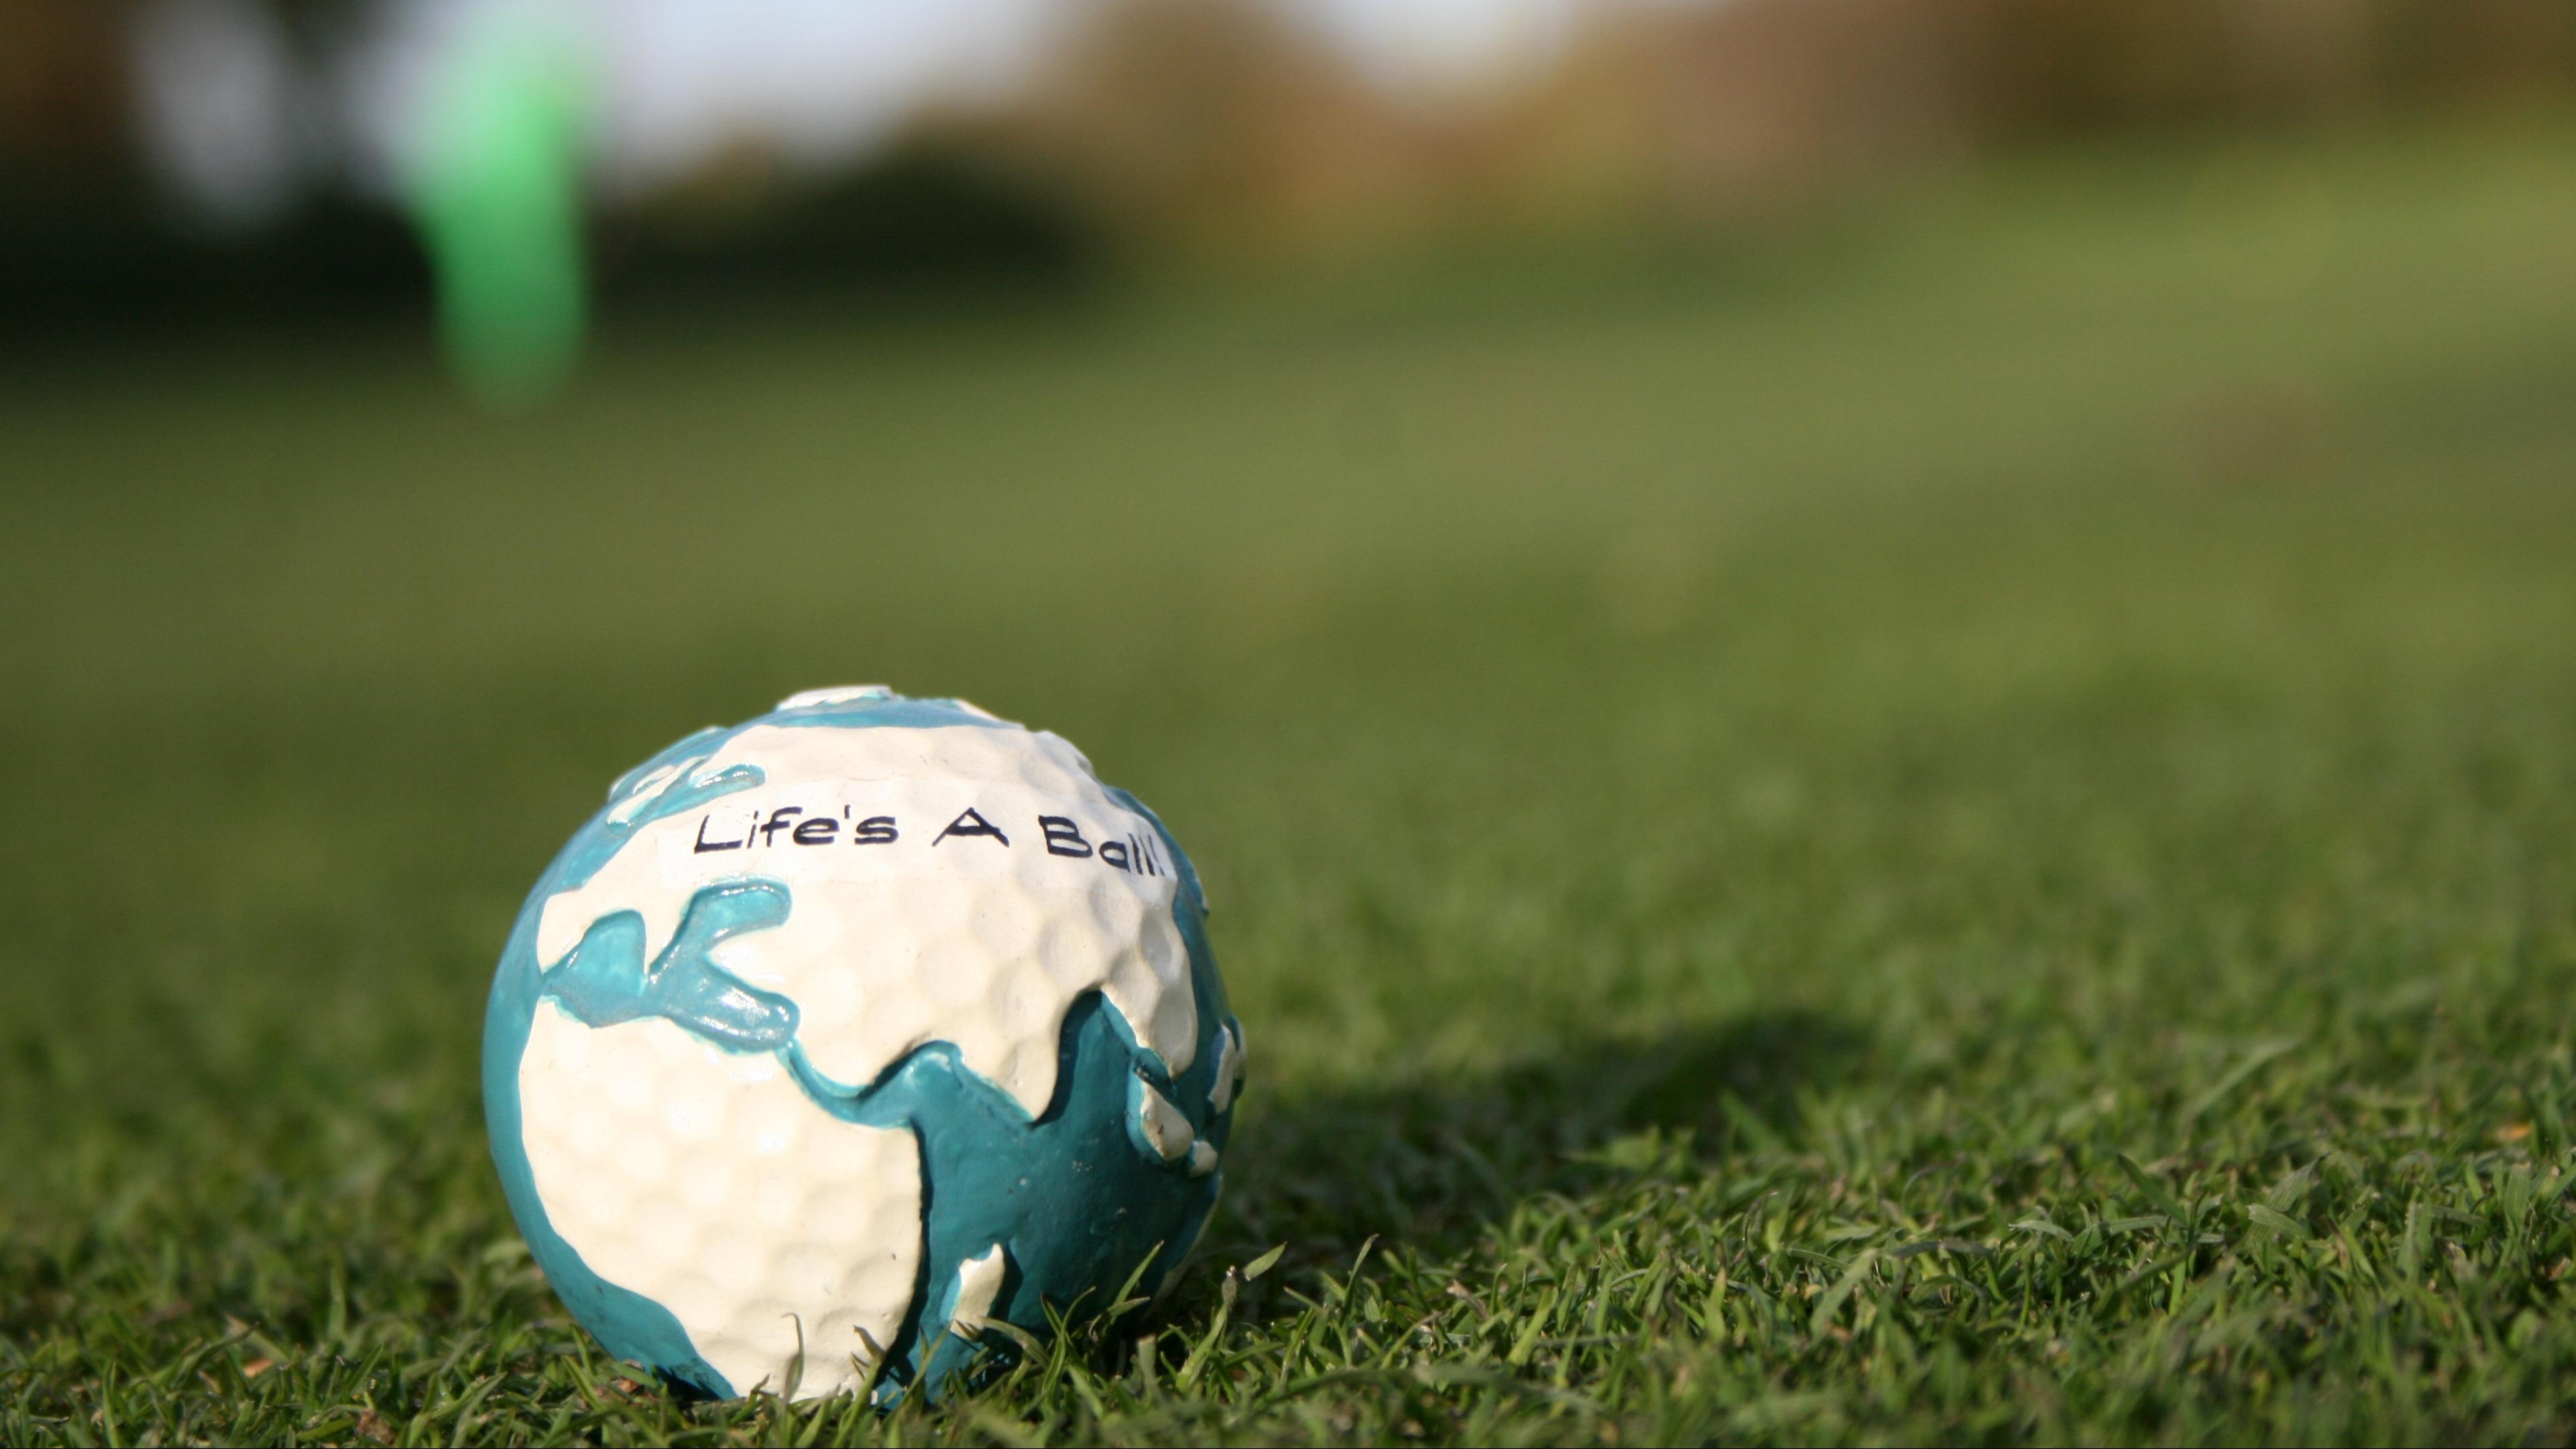 golf ball grass 4k 1540061539 - golf, ball, grass 4k - Grass, golf, Ball